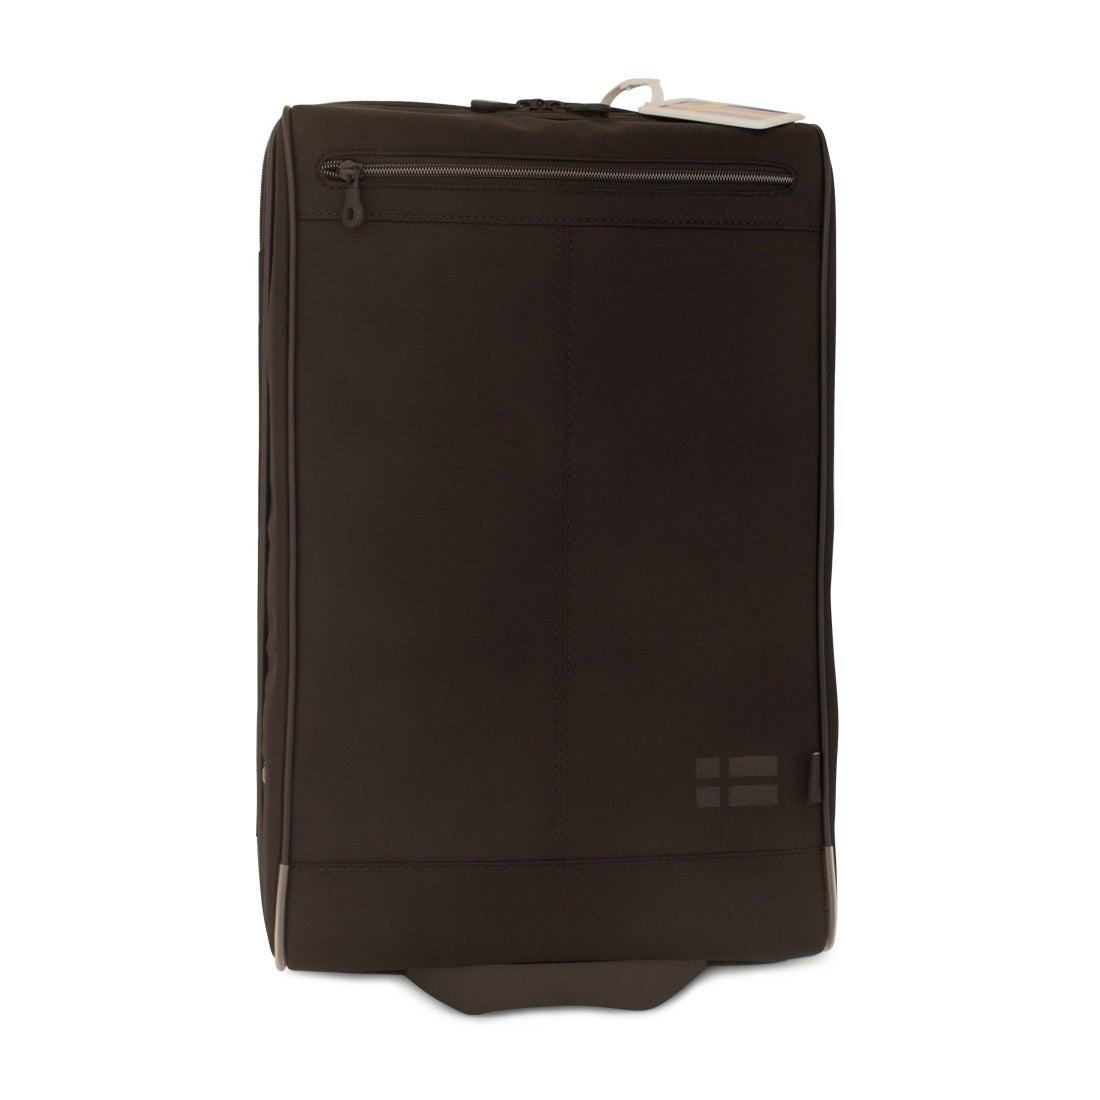 【SAC'S BAR】イノベーター innovator スーツケース GI-5321CD 55cm GIコーデュラ BLACK/BLACK メンズ